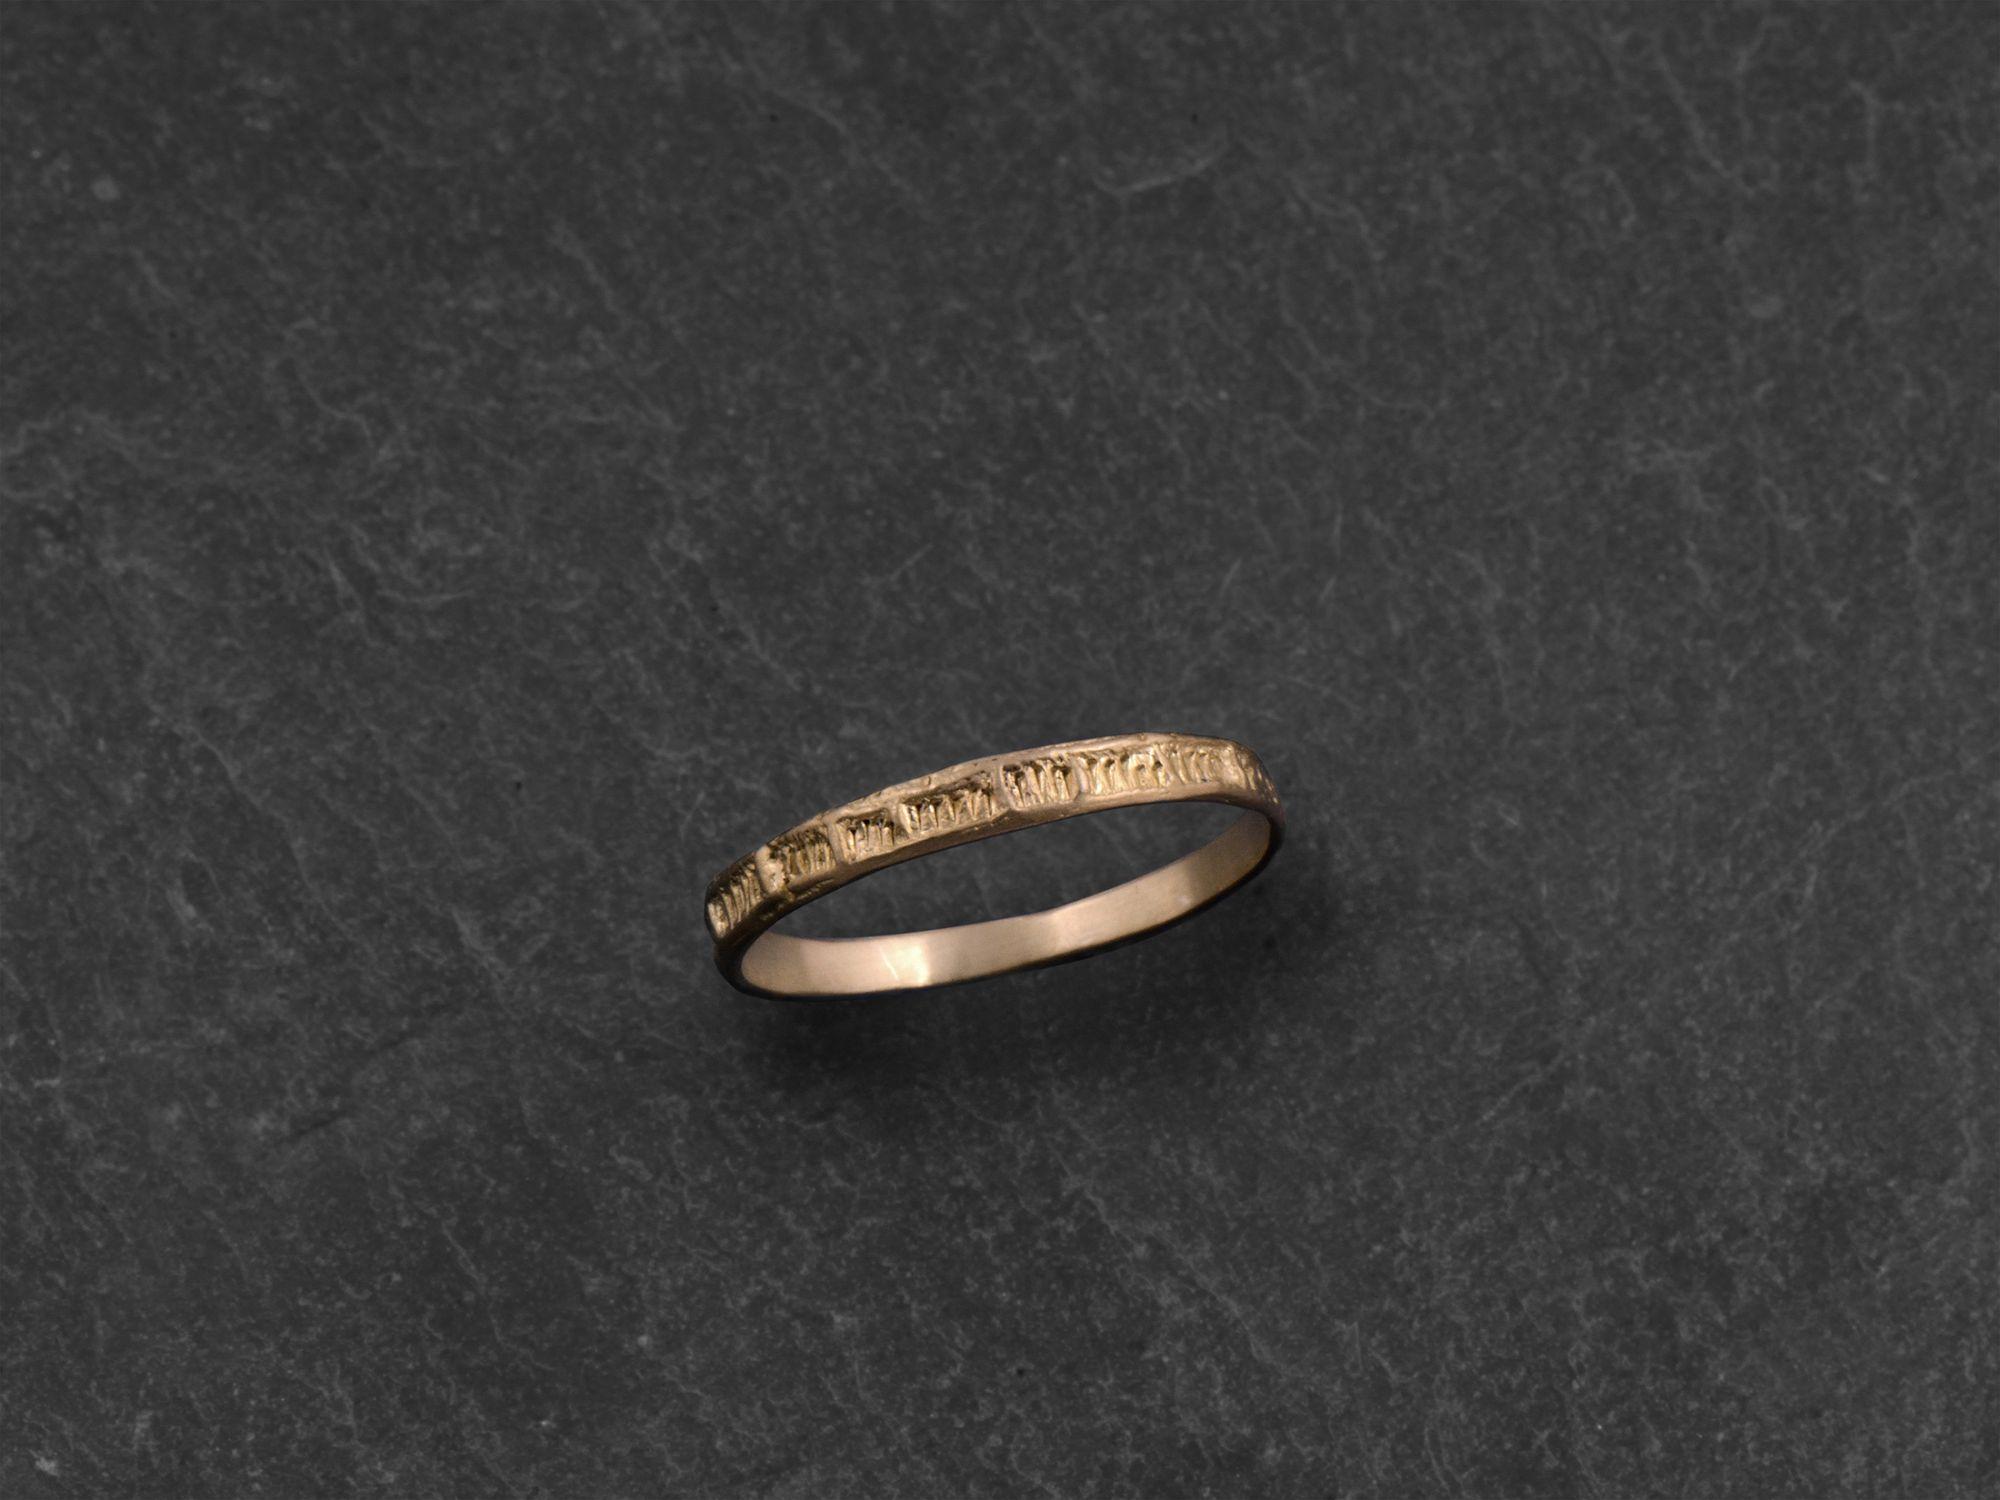 Minos vermeil ring by Emmanuelle Zysman